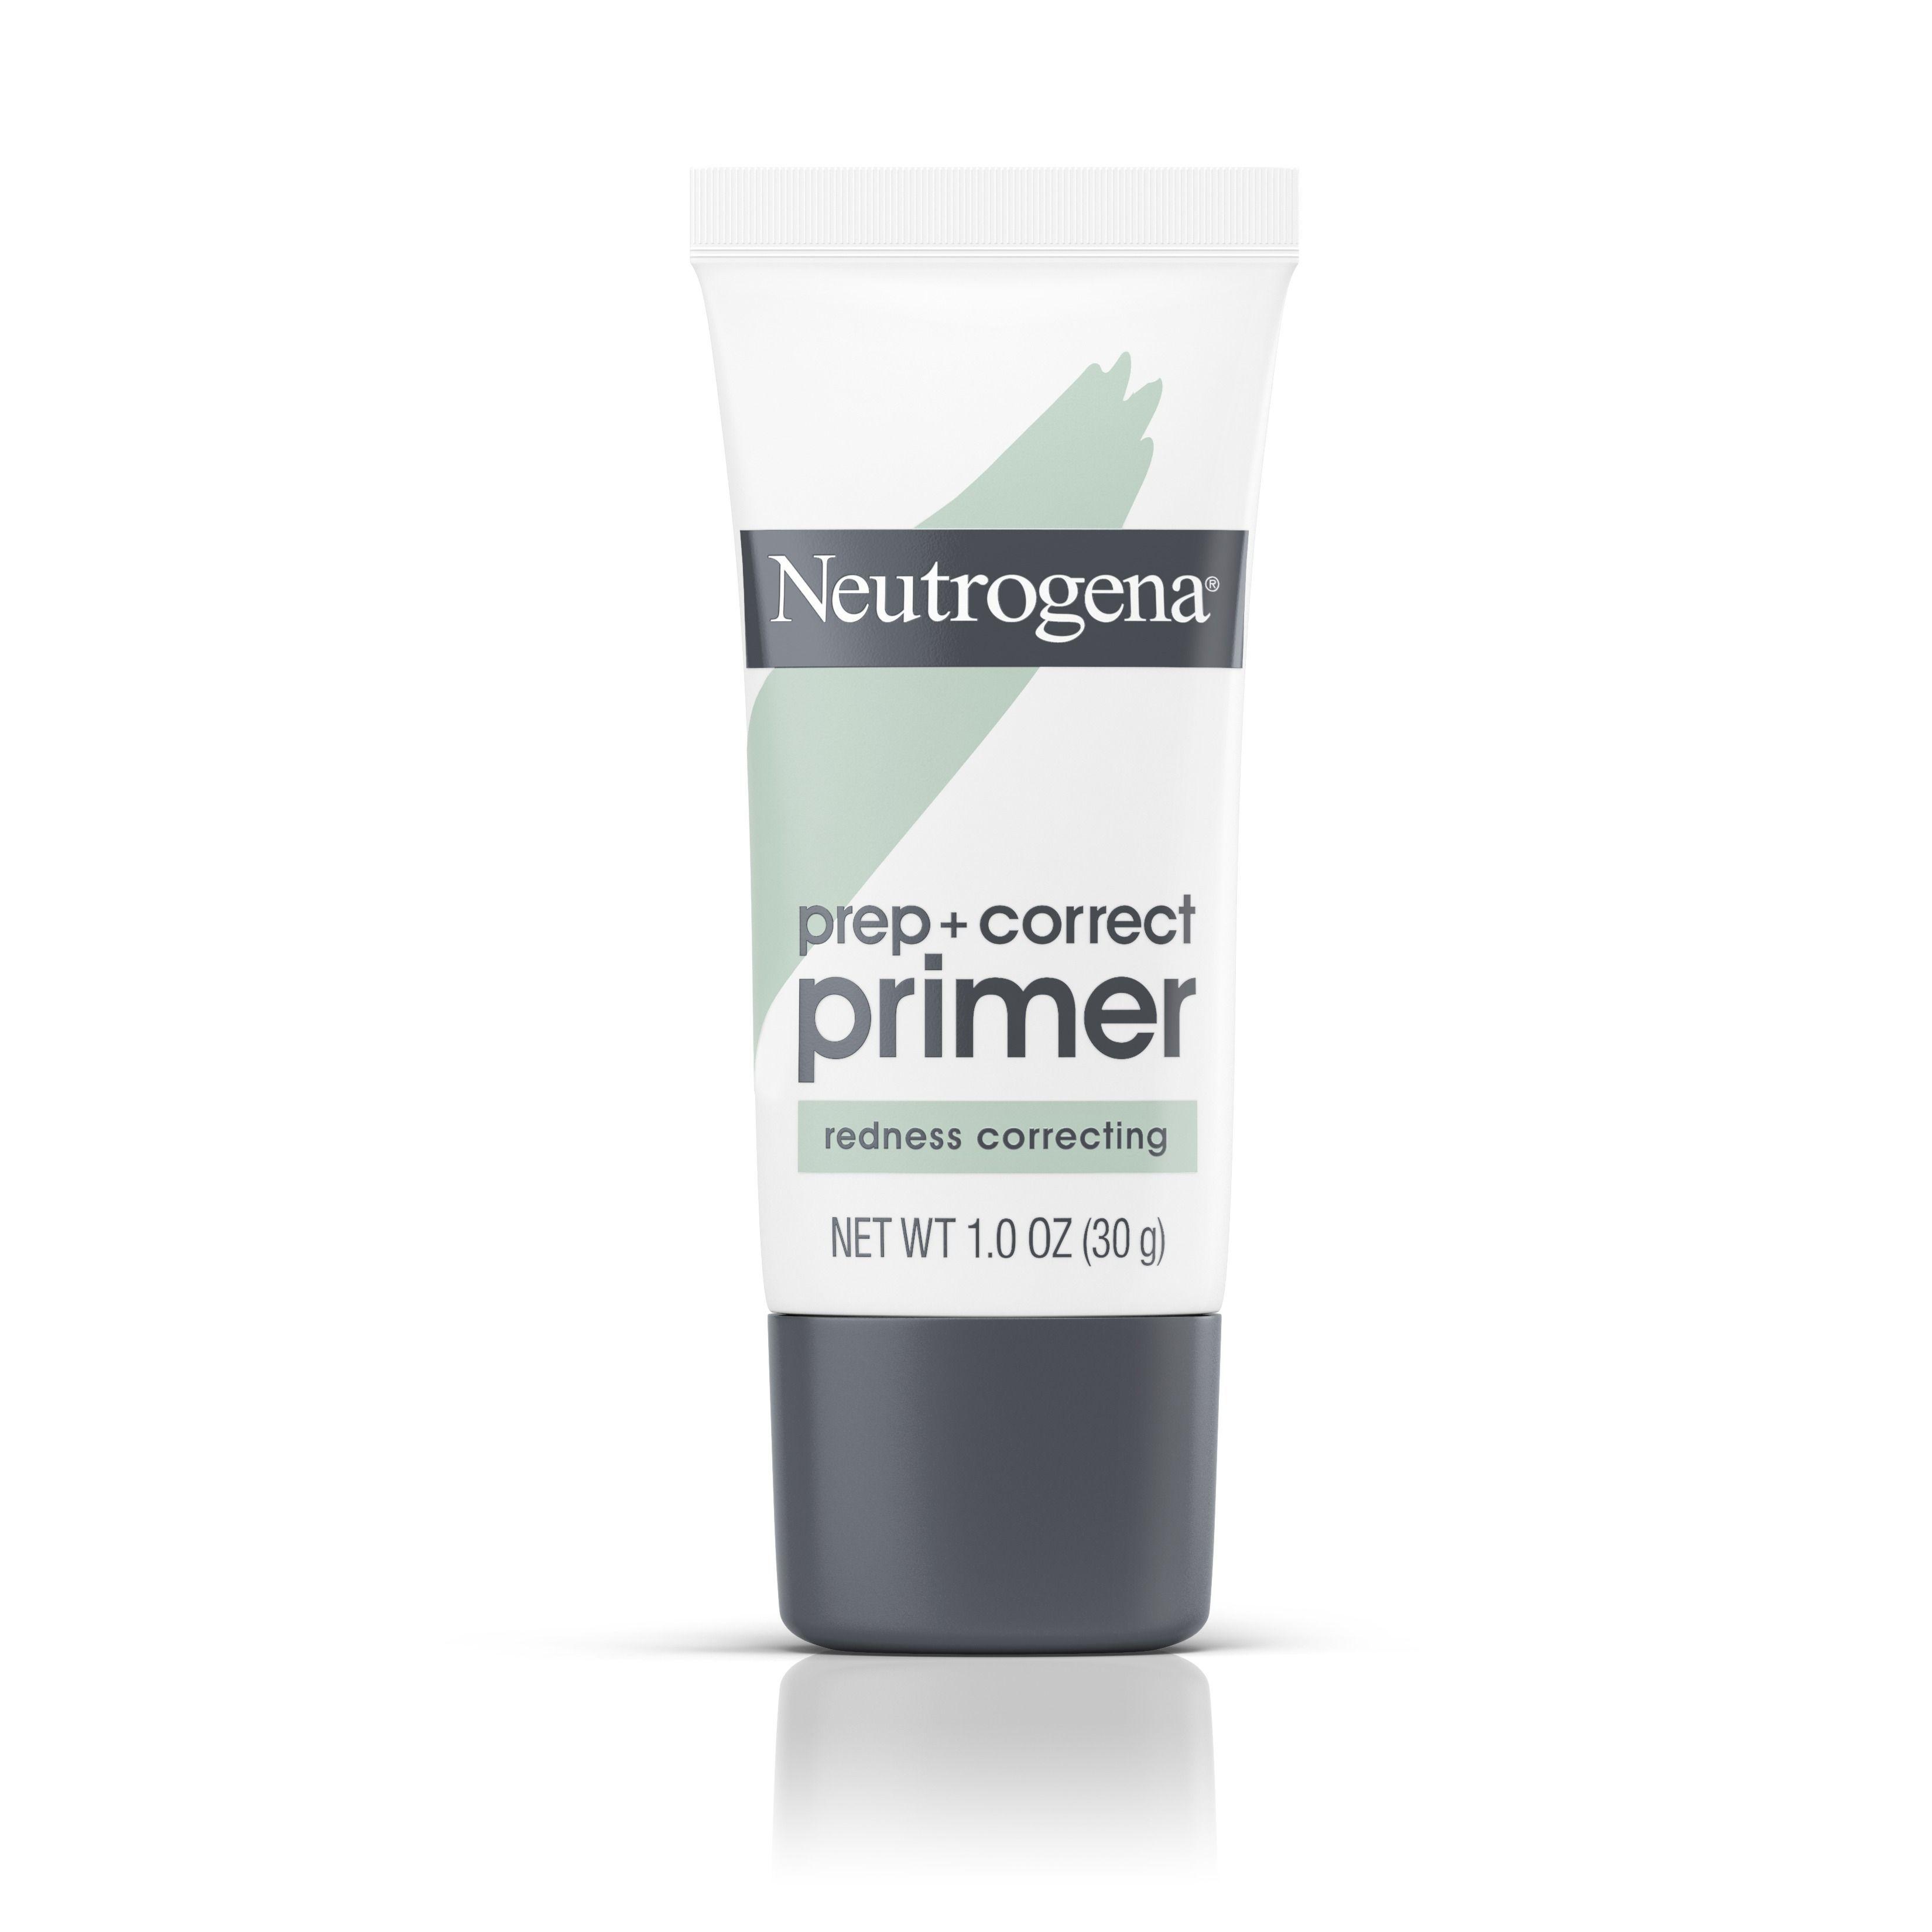 Neutrogena® Prep + Primer correcto, correcto Neutrogena